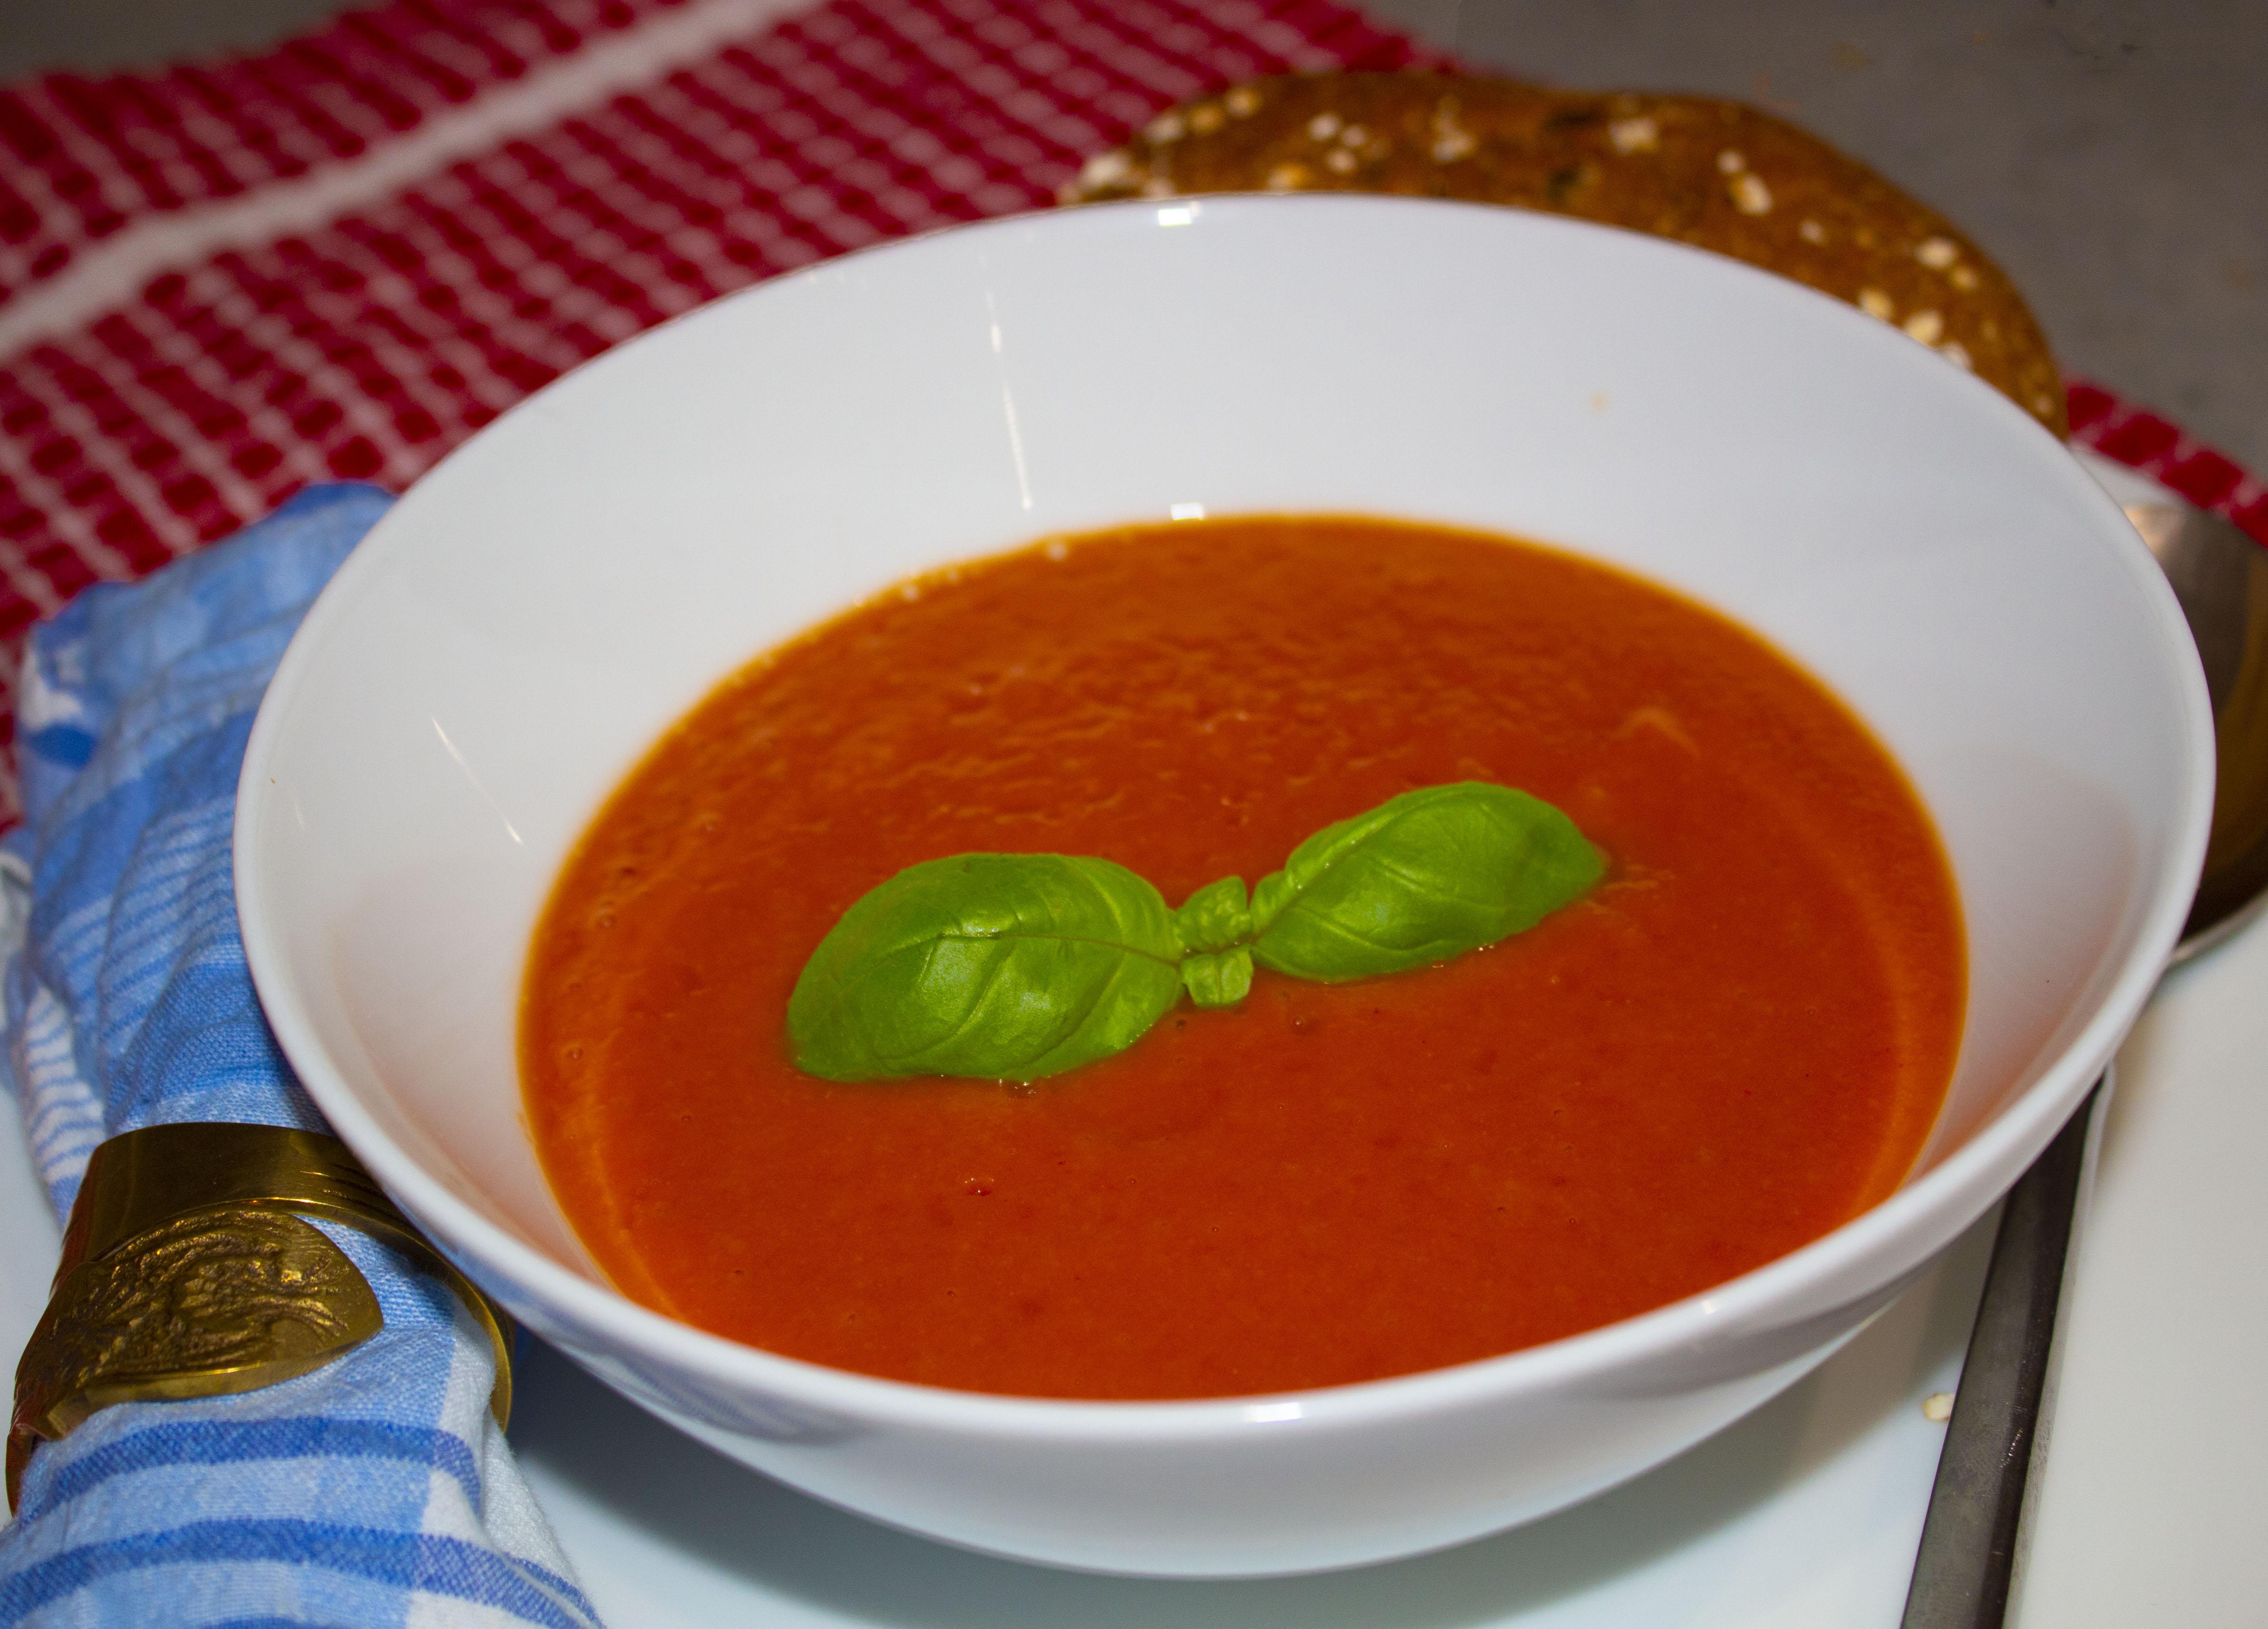 Cream of tomato soup recipe with Beko #EatLikeAPro